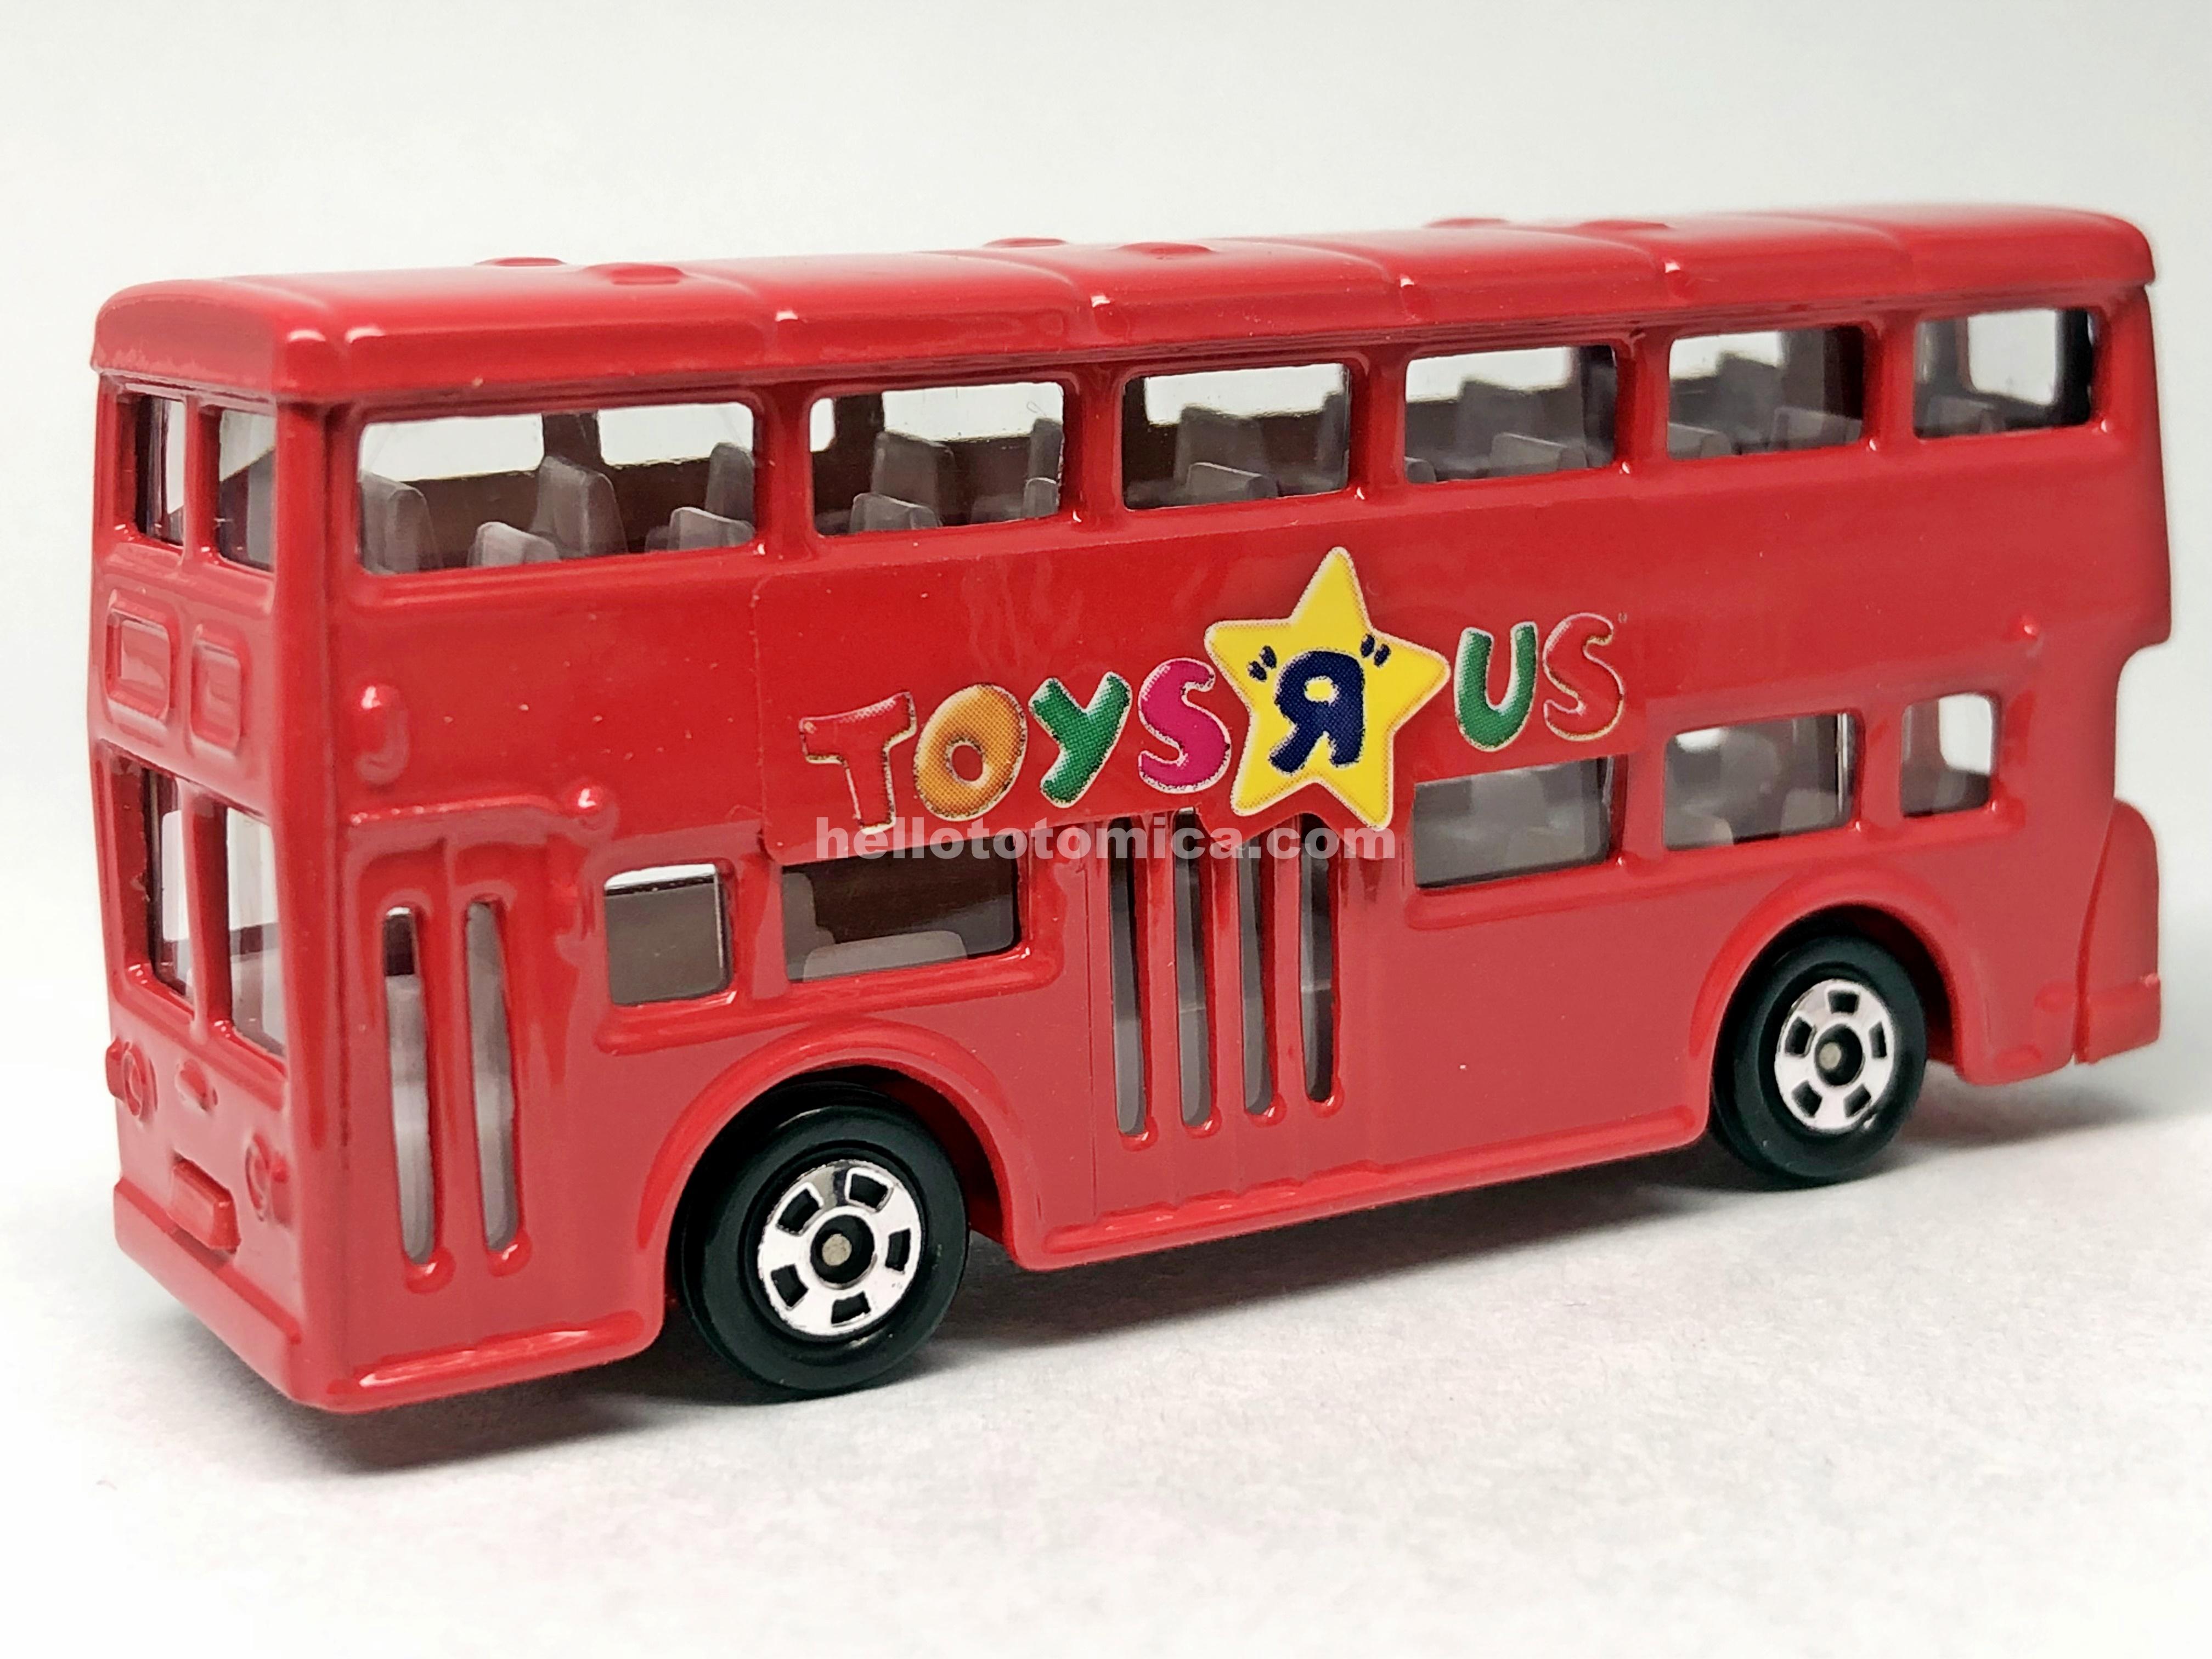 95-3 LONDON BUS